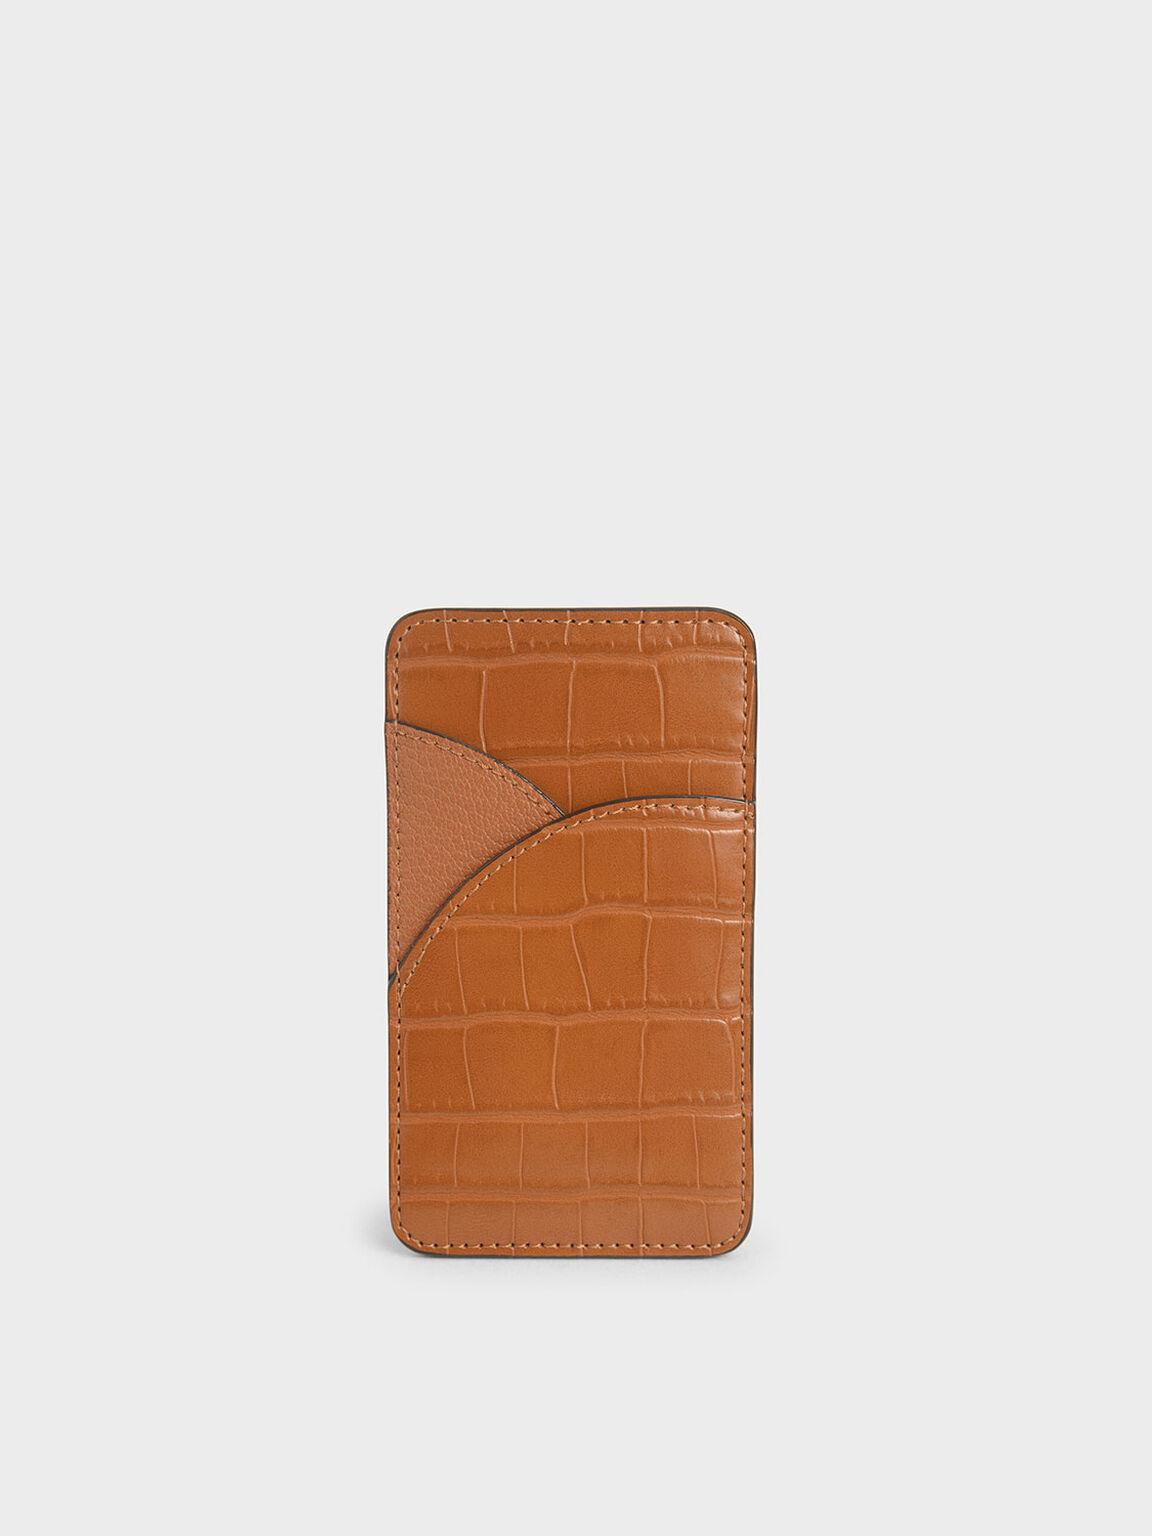 Croc-Effect Elongated Card Holder, Cognac, hi-res